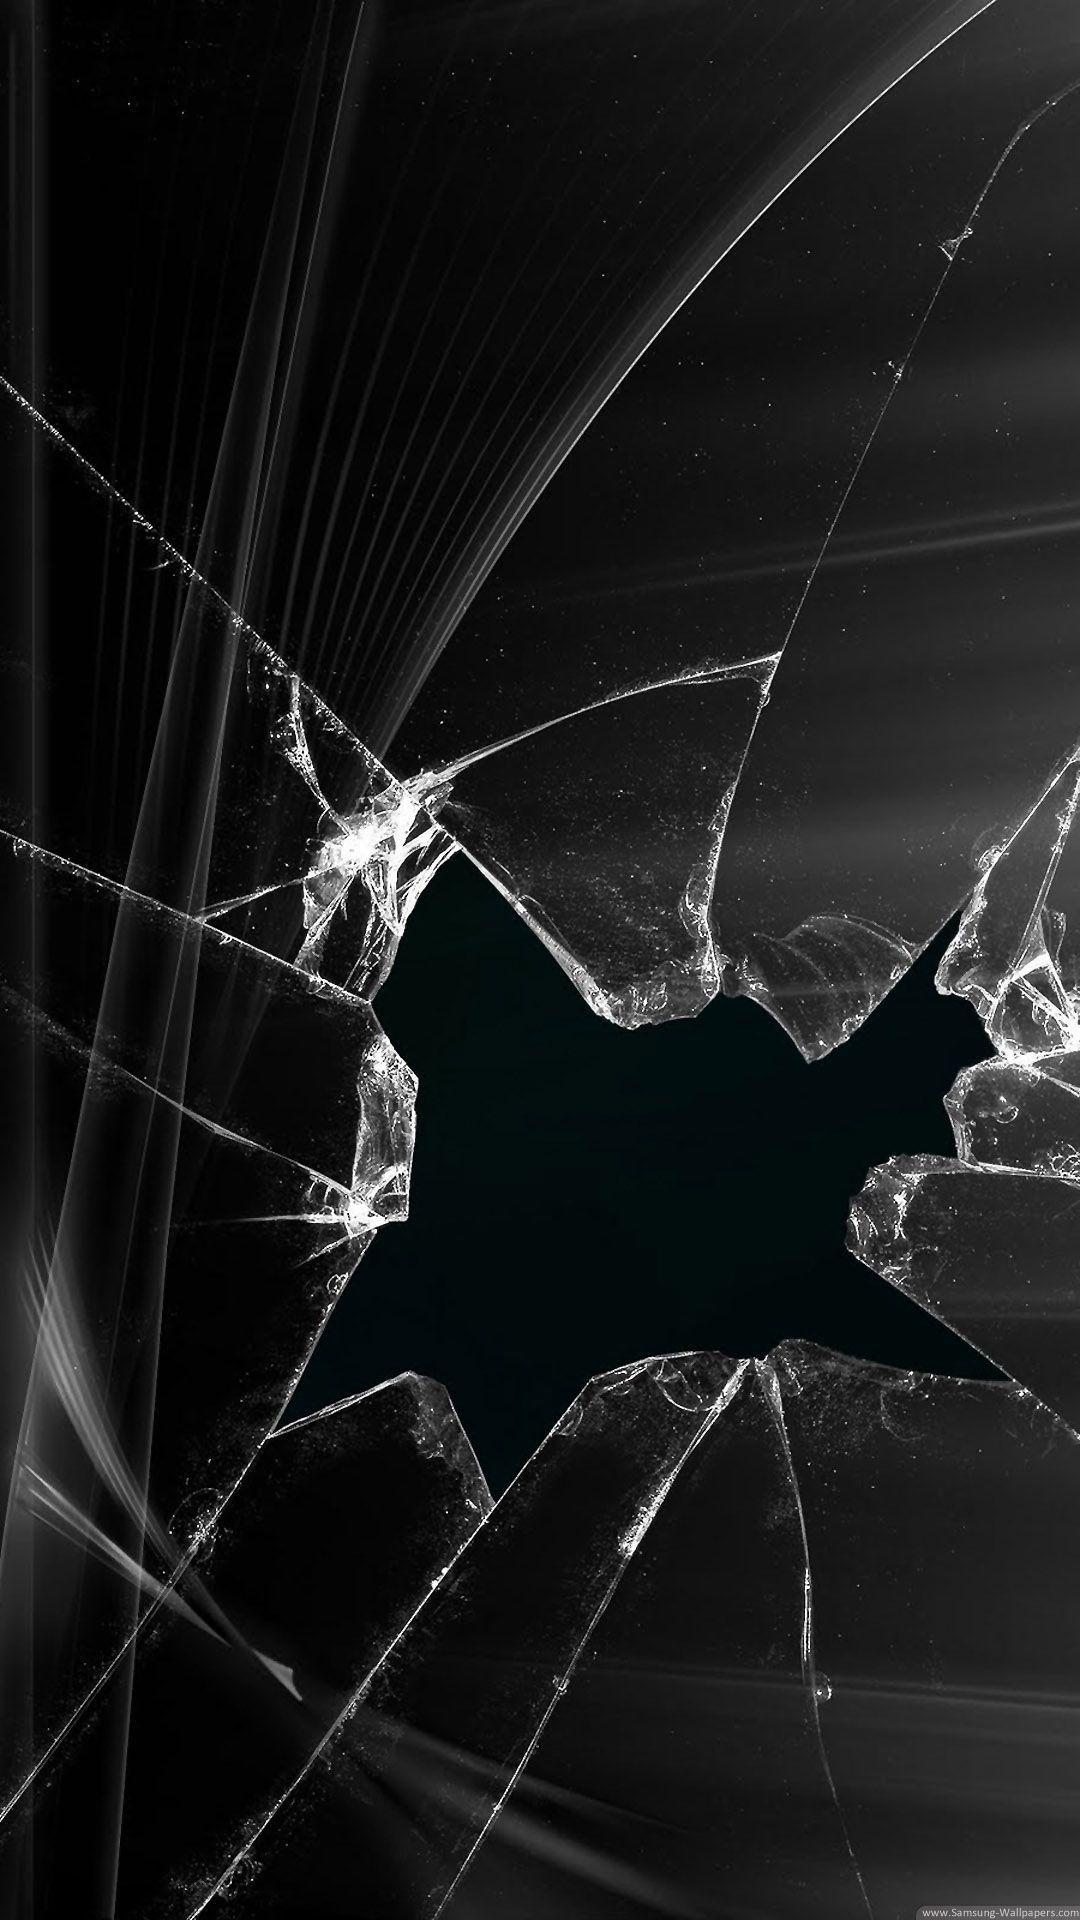 Shattered Glasses Backgrounds Black 1080p Wallpaper Cave